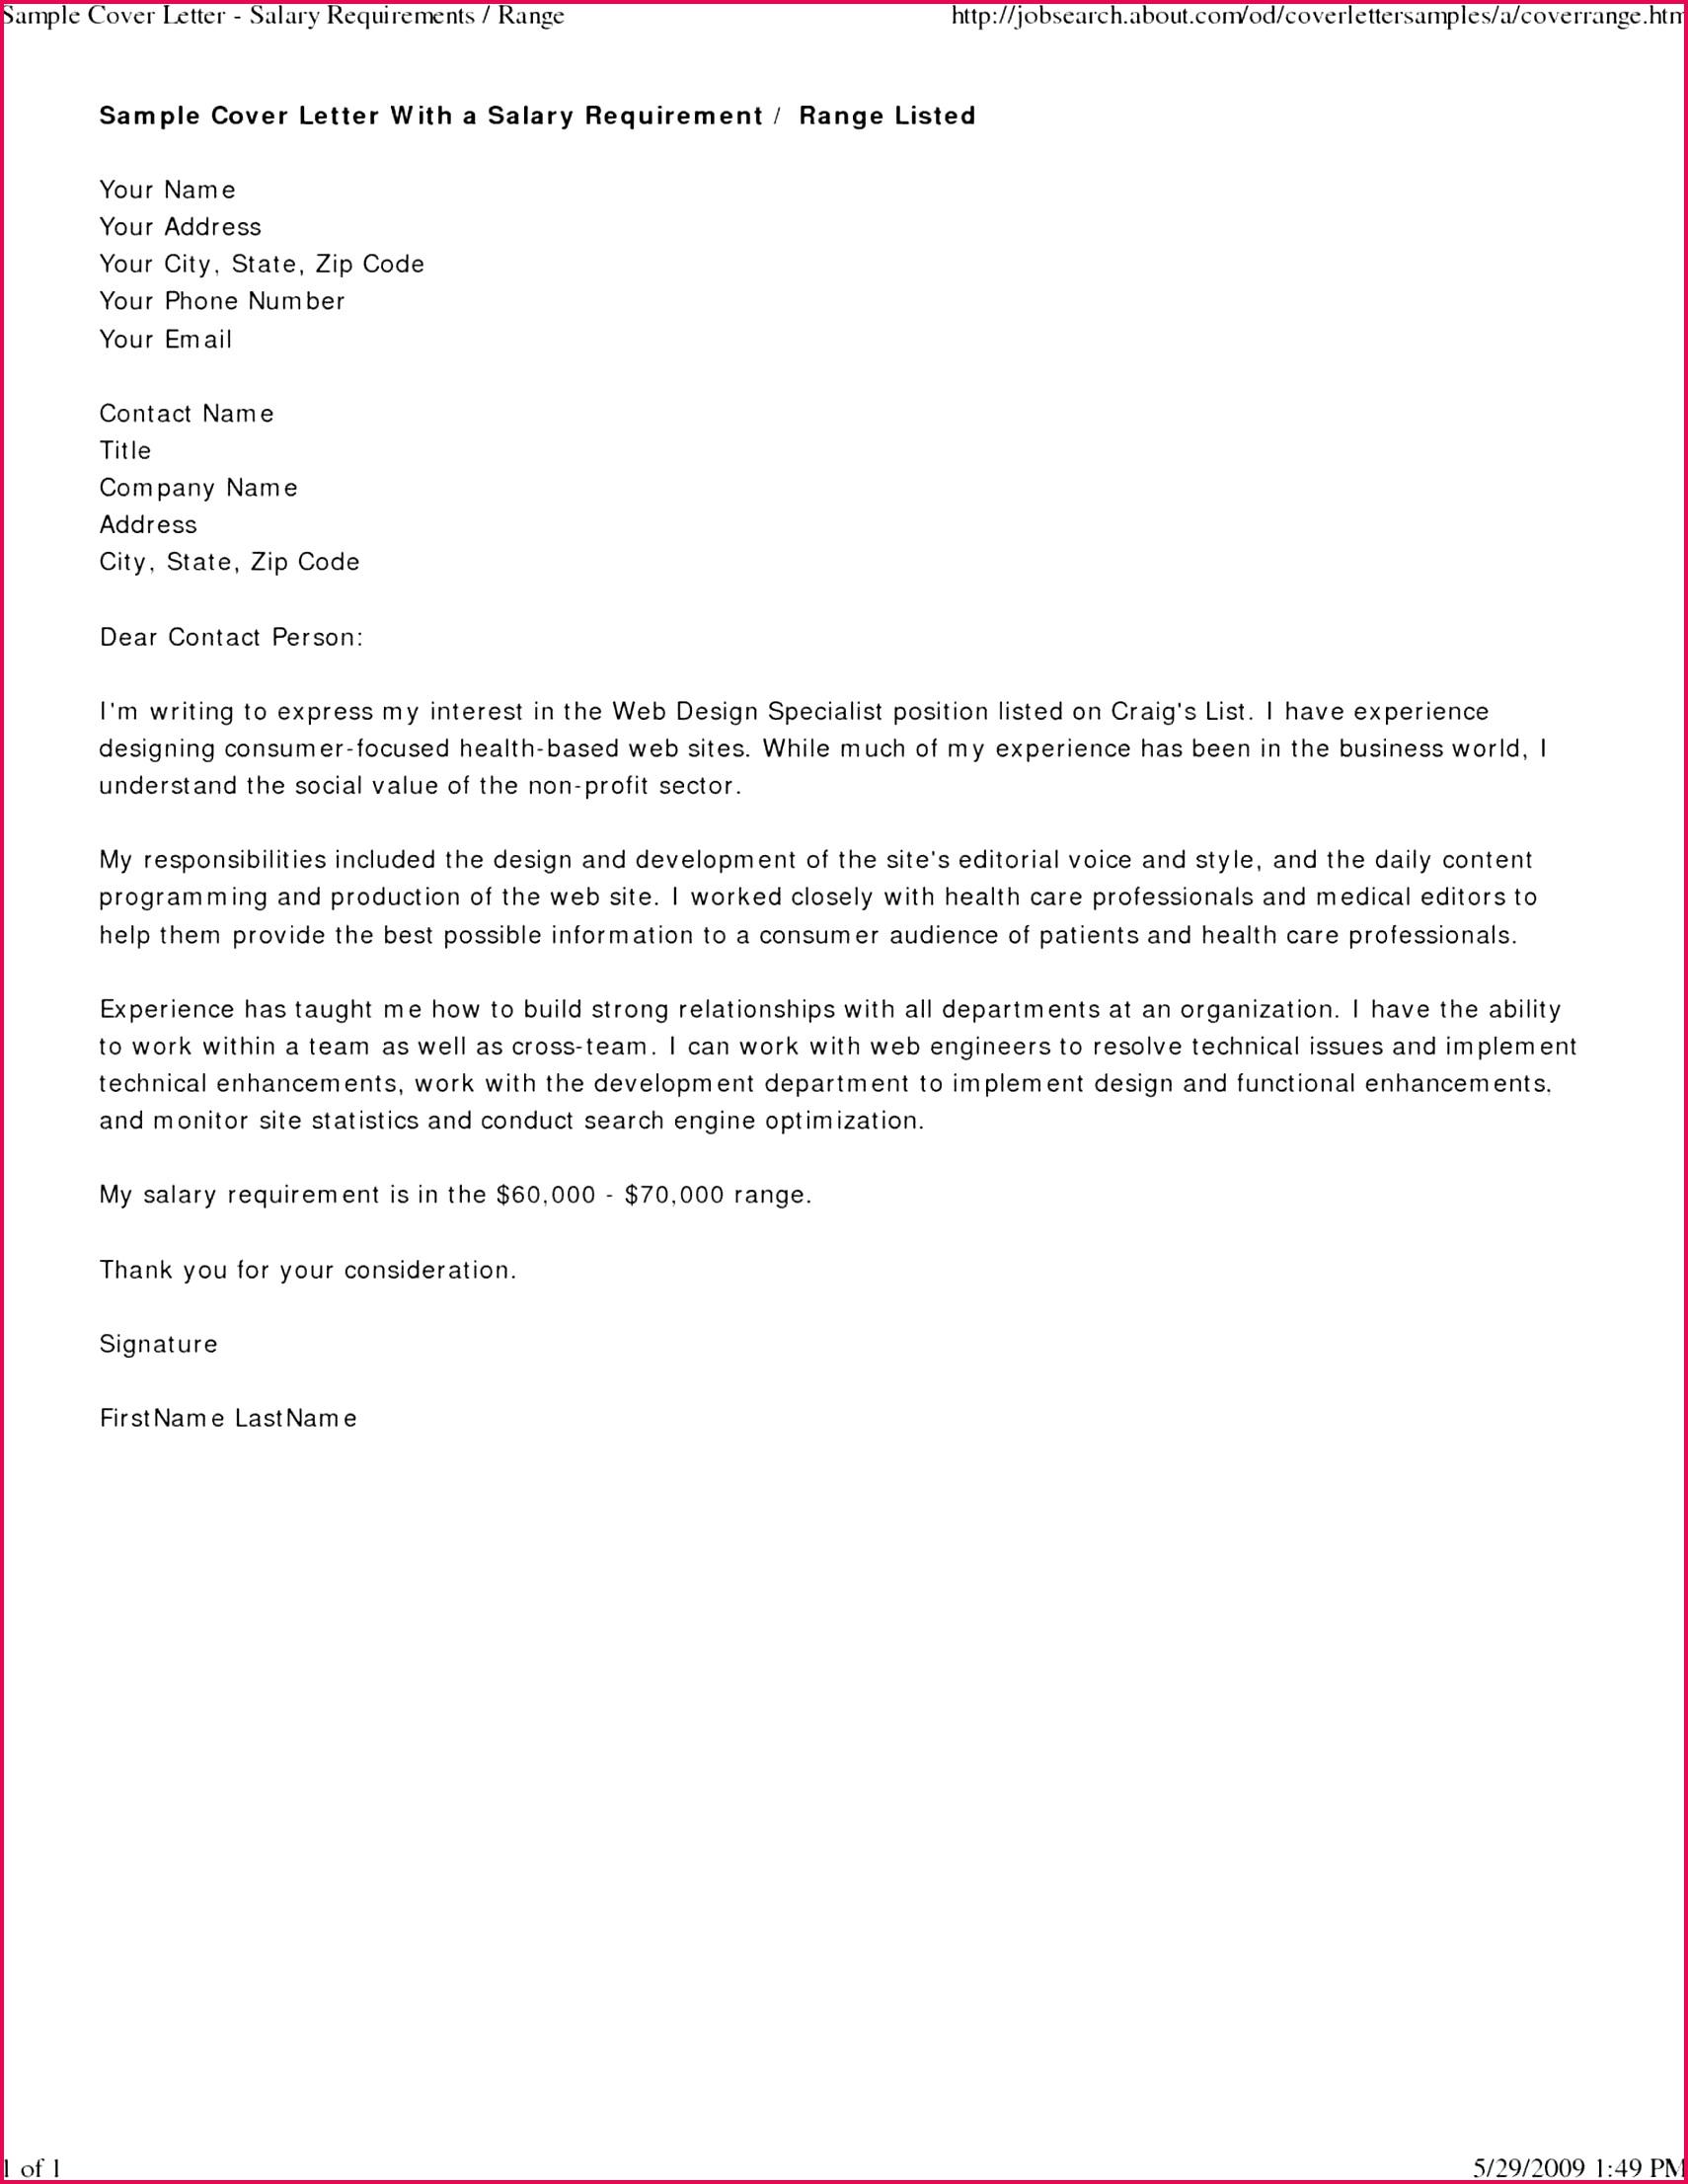 Emt Cover Letter Examples Unique Emt Cover Letter Beautiful Inspirational Job Application Letter